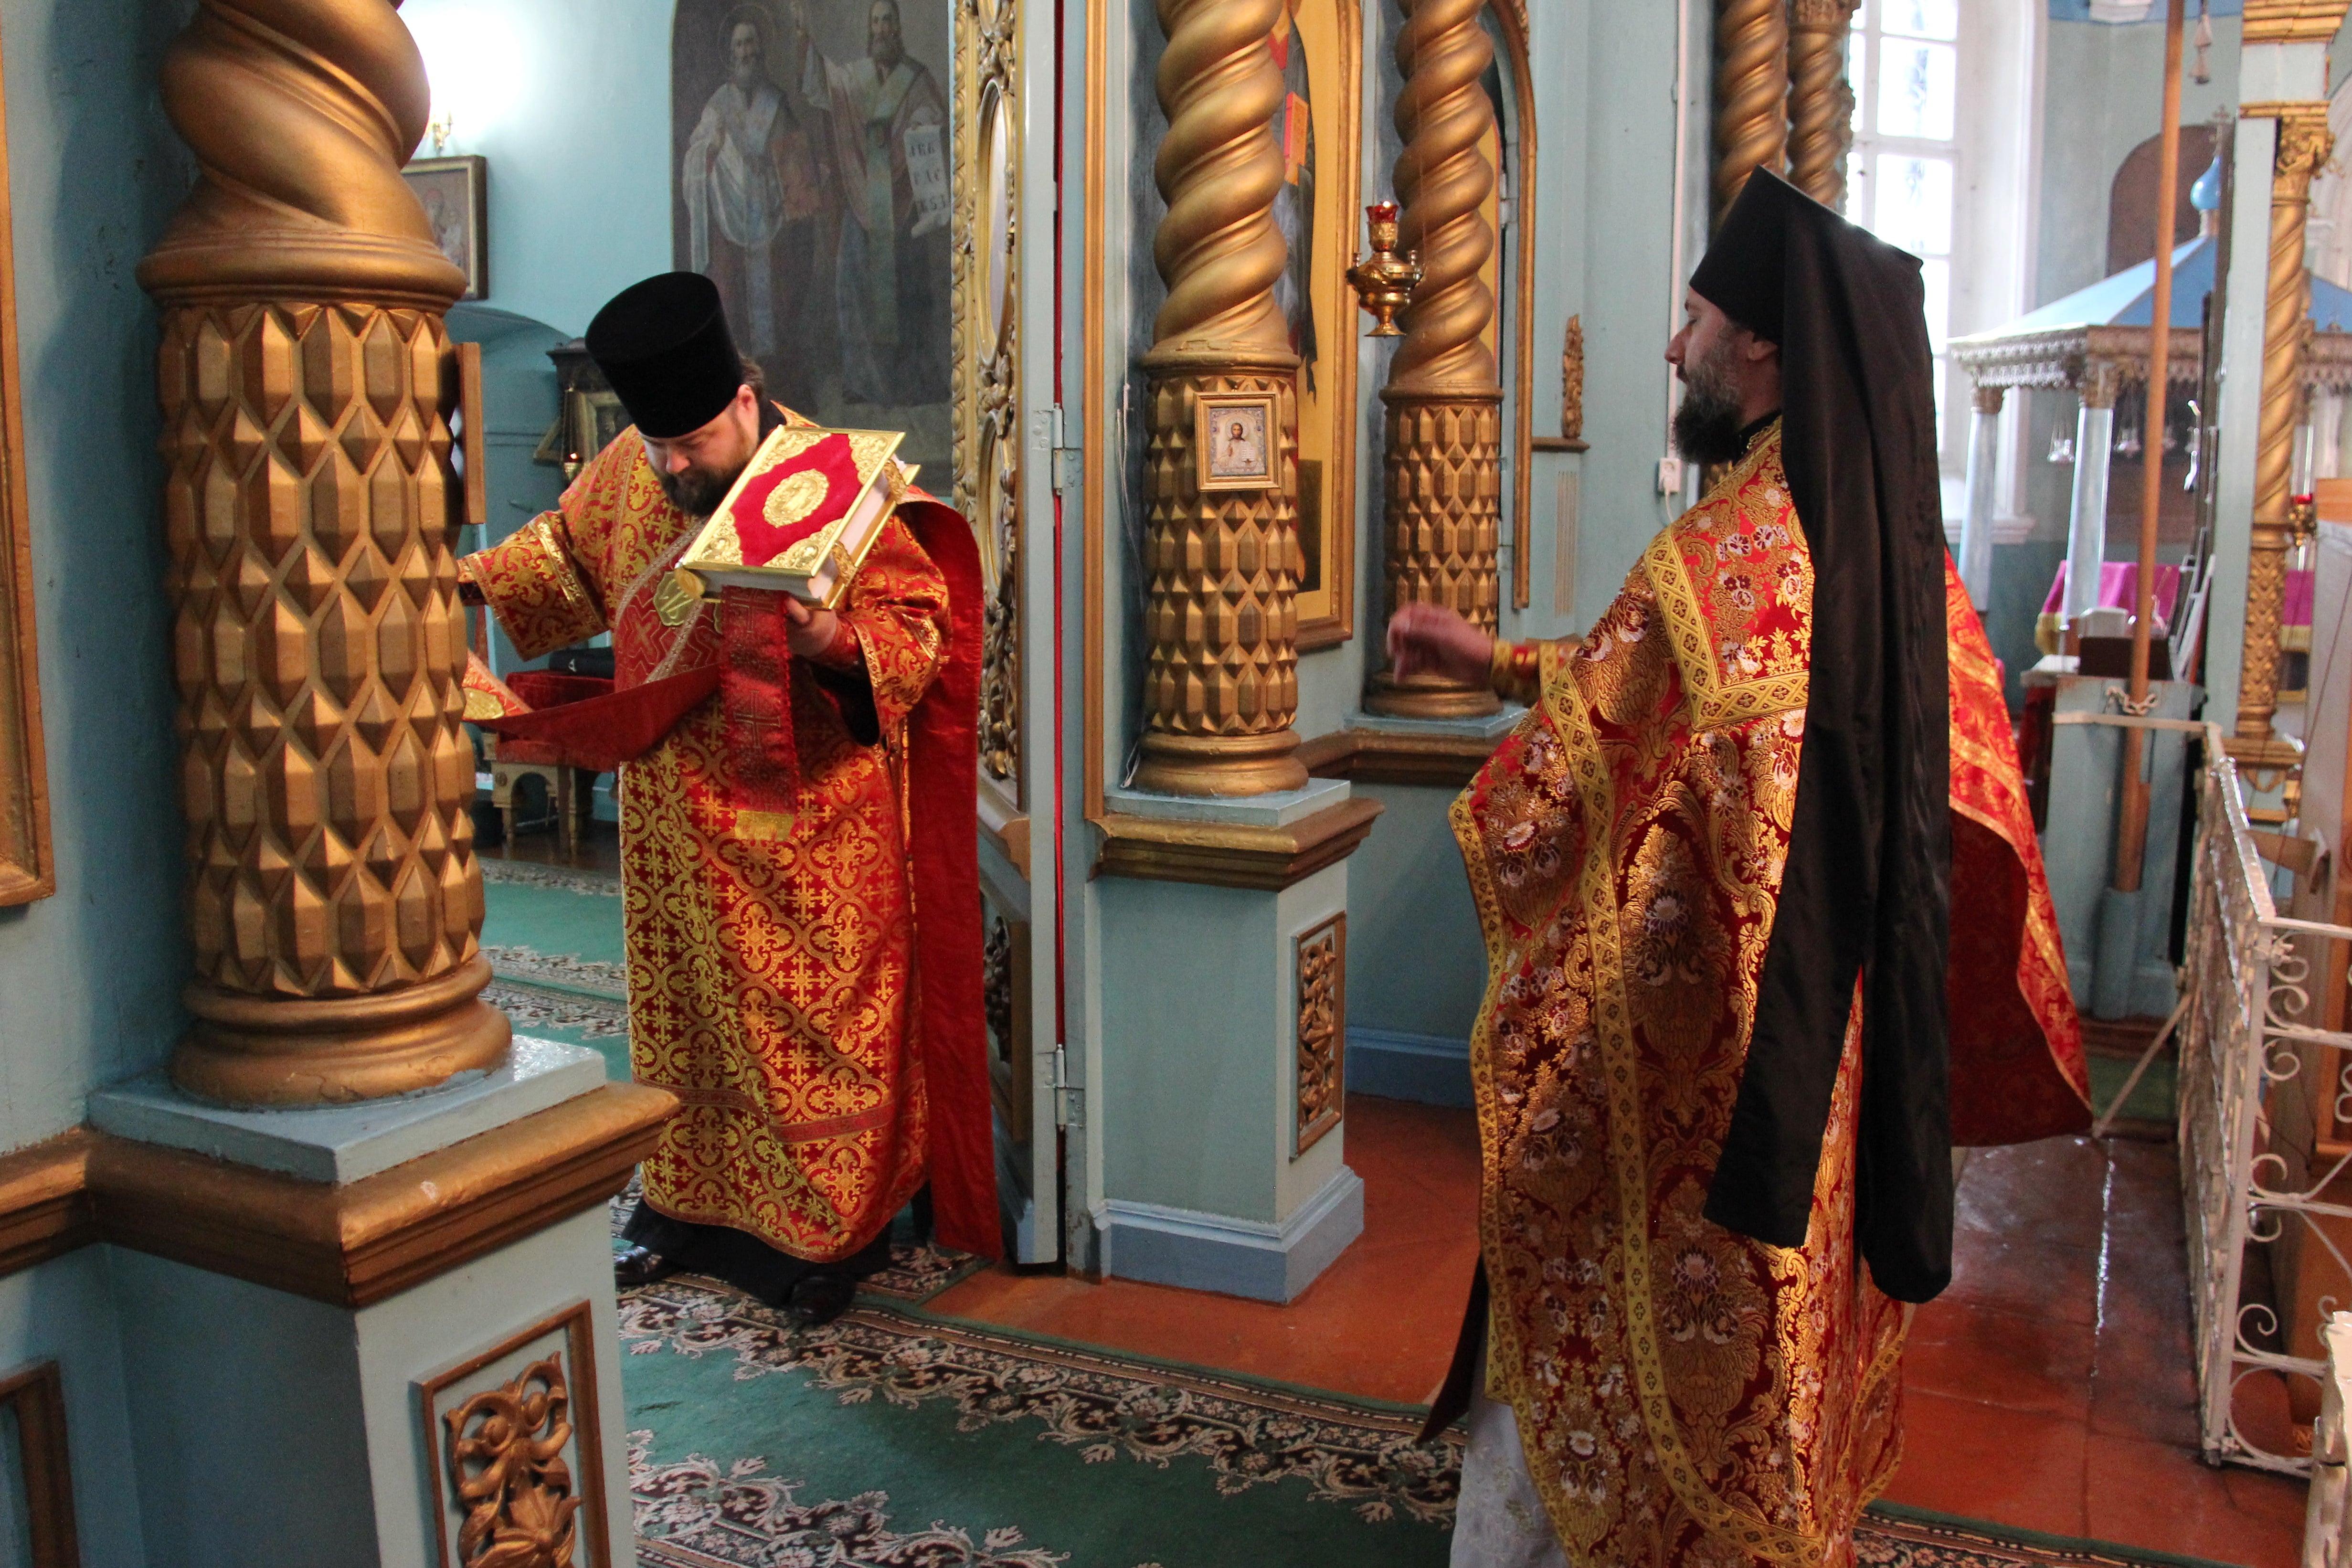 http://monuspen.ru/photoreports/761cedcebac14ed511129cb83b587d42.JPG